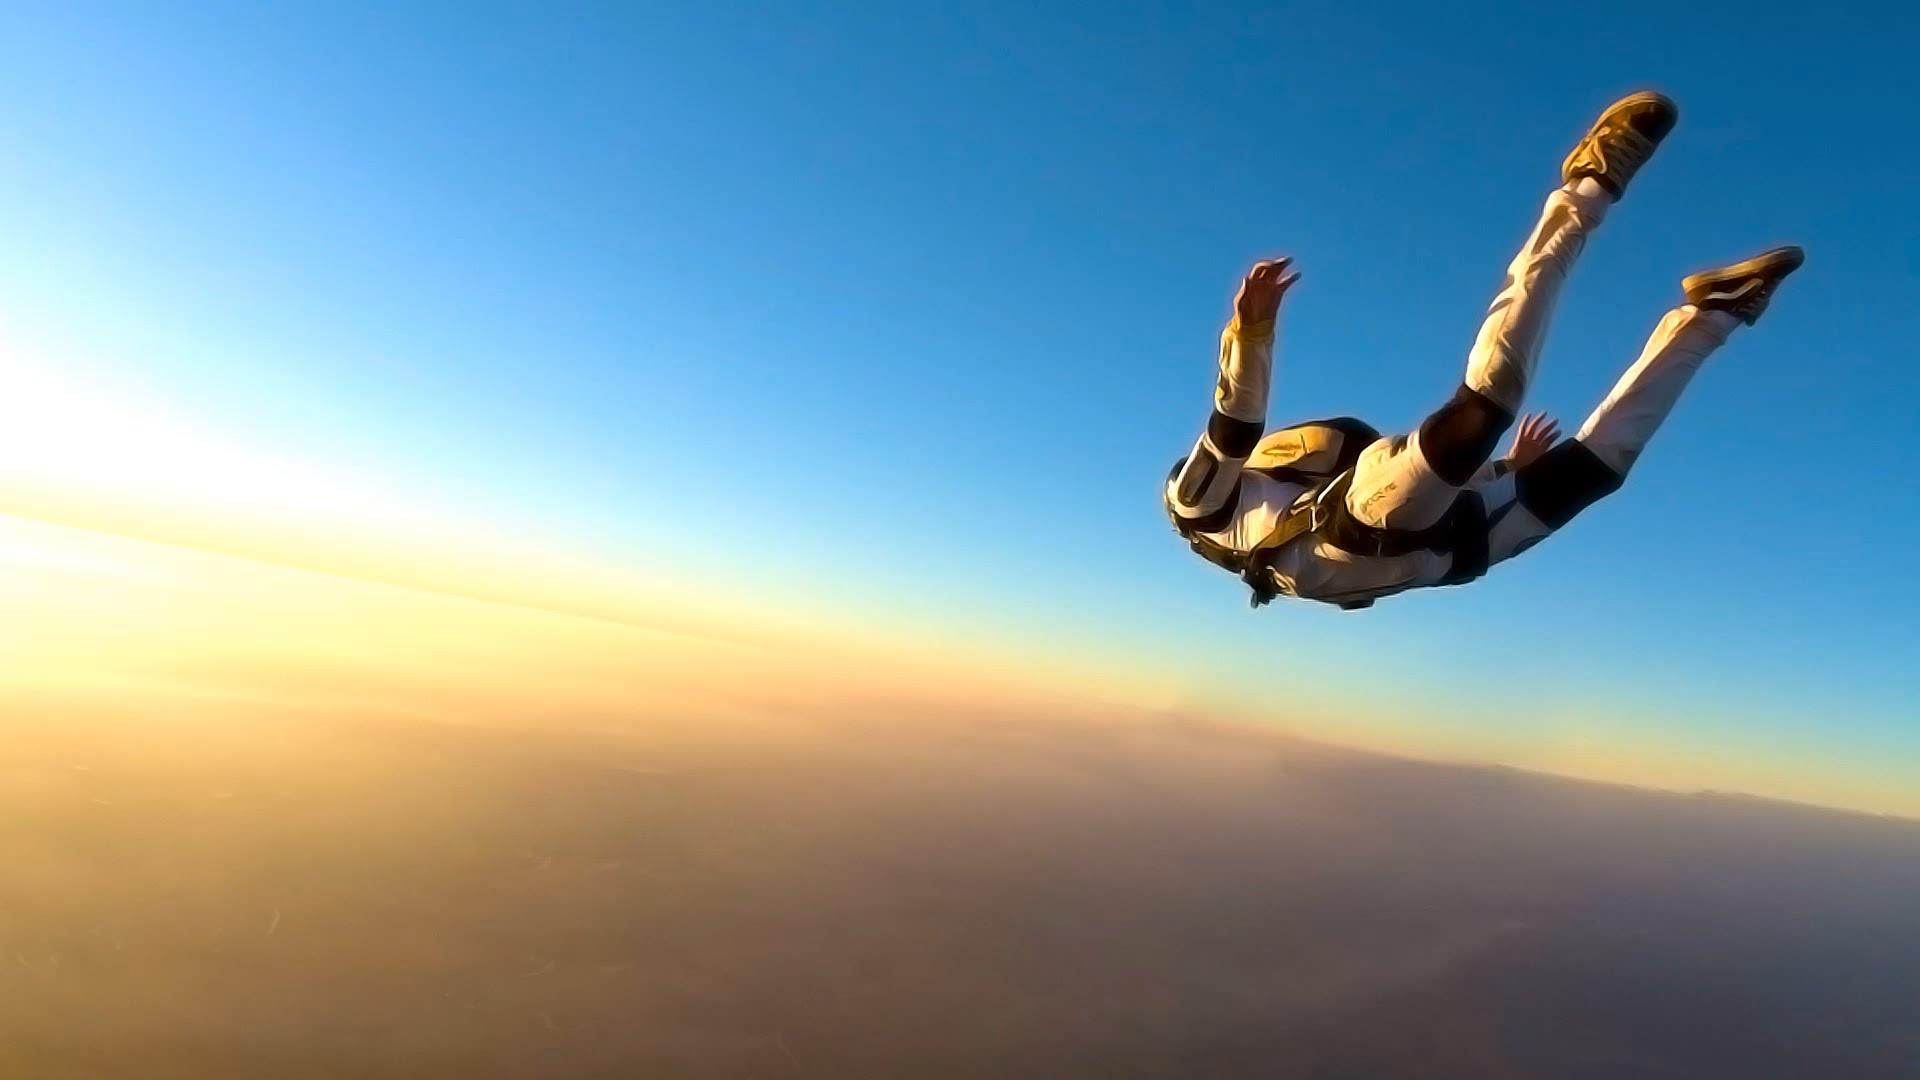 Adenture sports - Skydiving